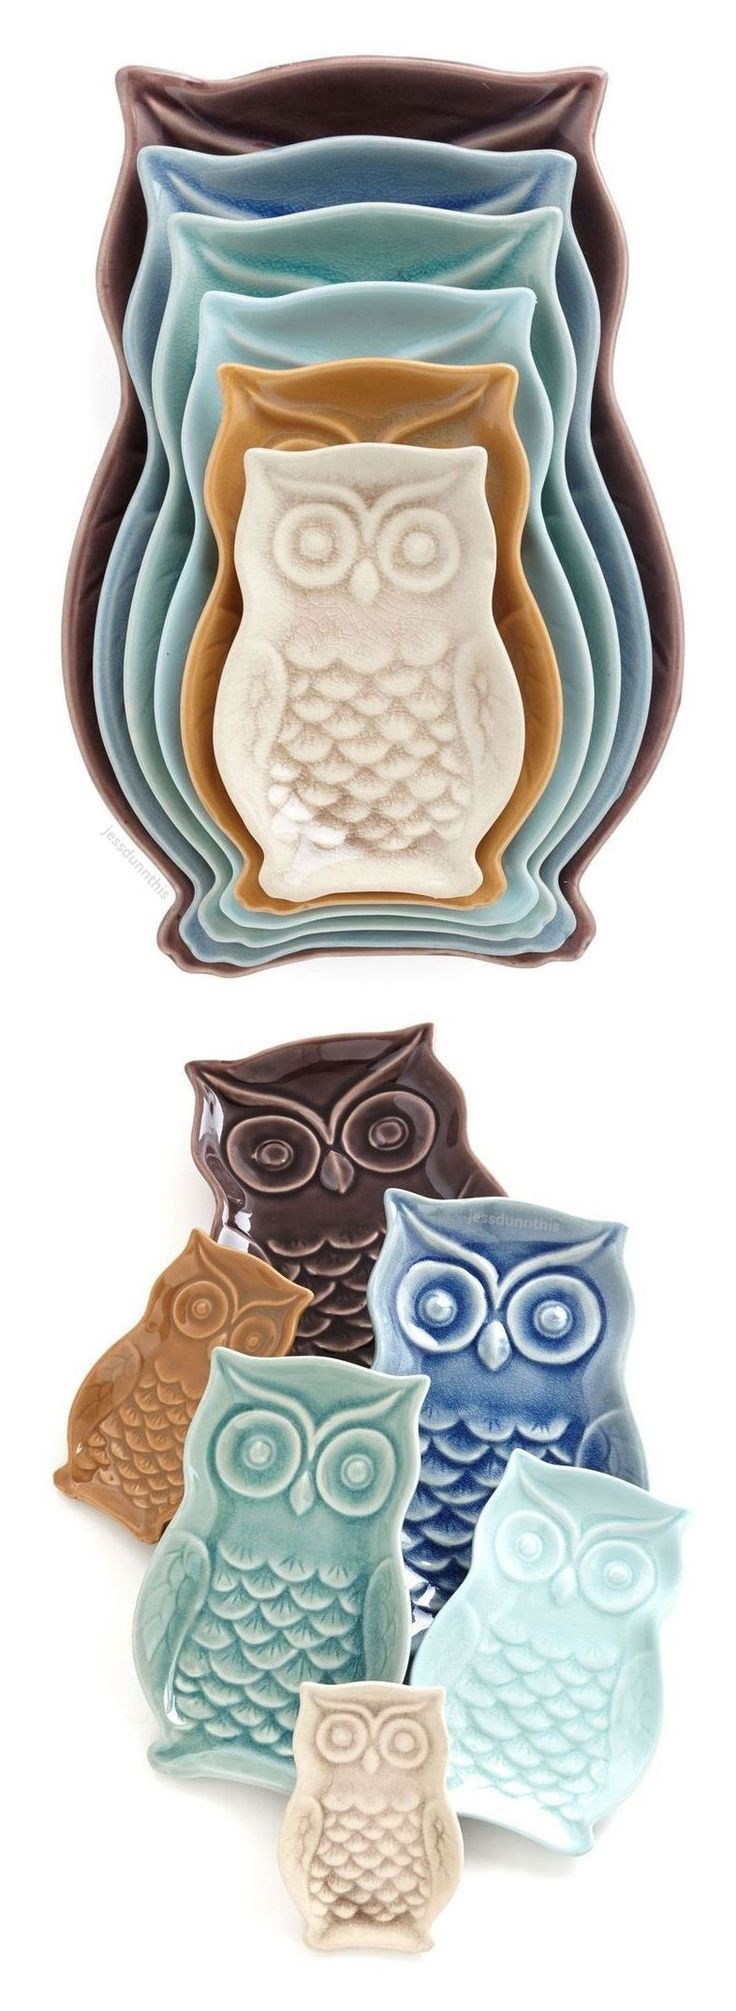 best 20 owl kitchen decor ideas on pinterest owl kitchen owl